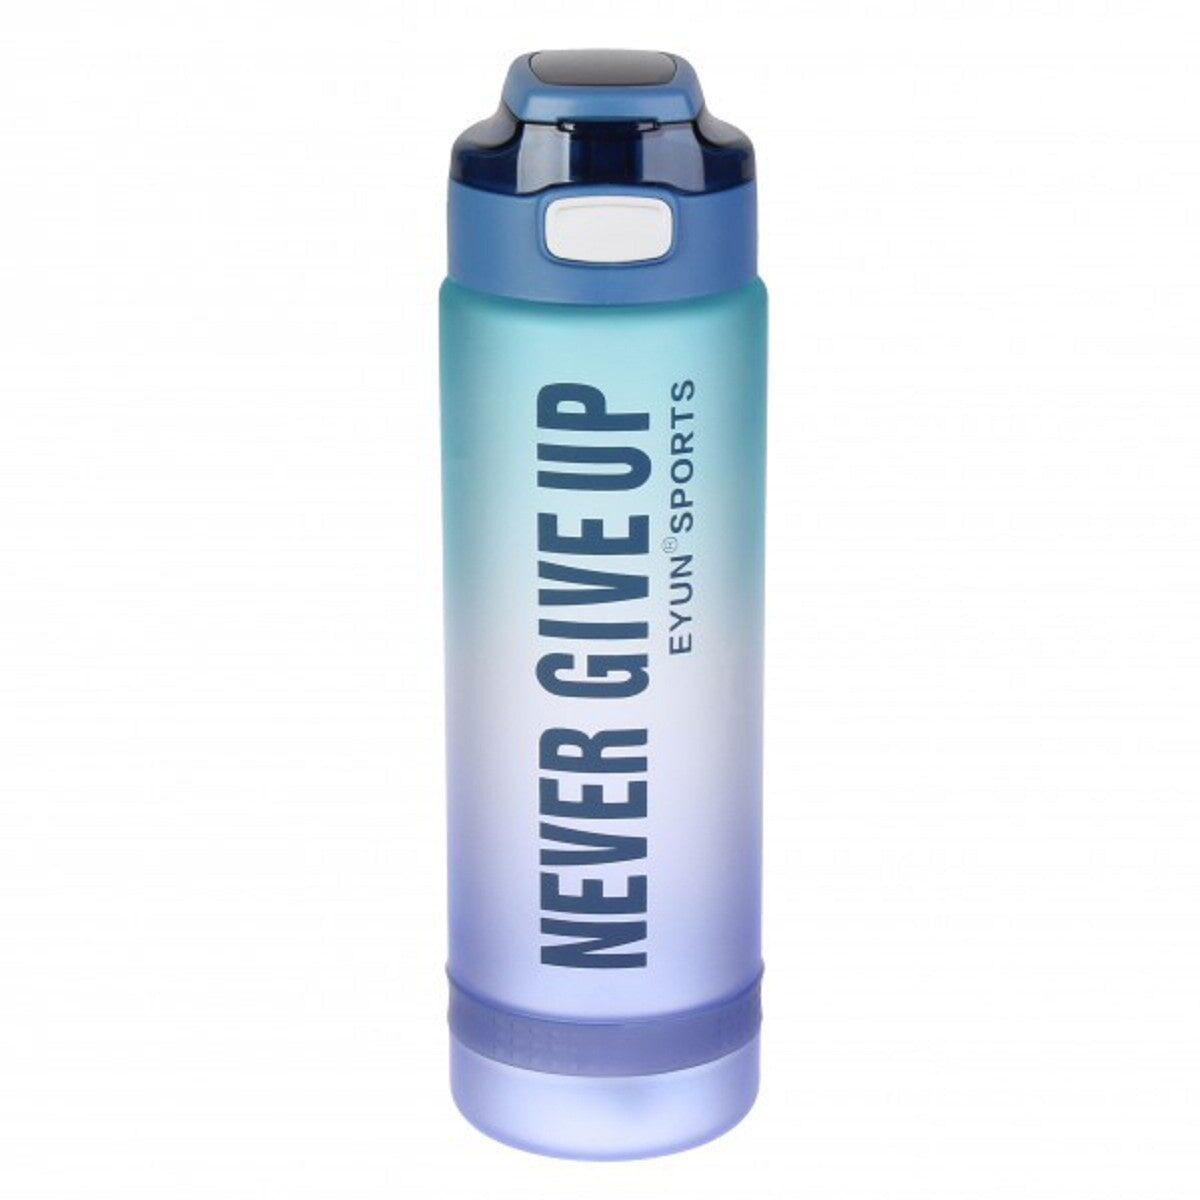 Пляшка для води Never Give Up 1 литр, градієнт синьо-фіолетова